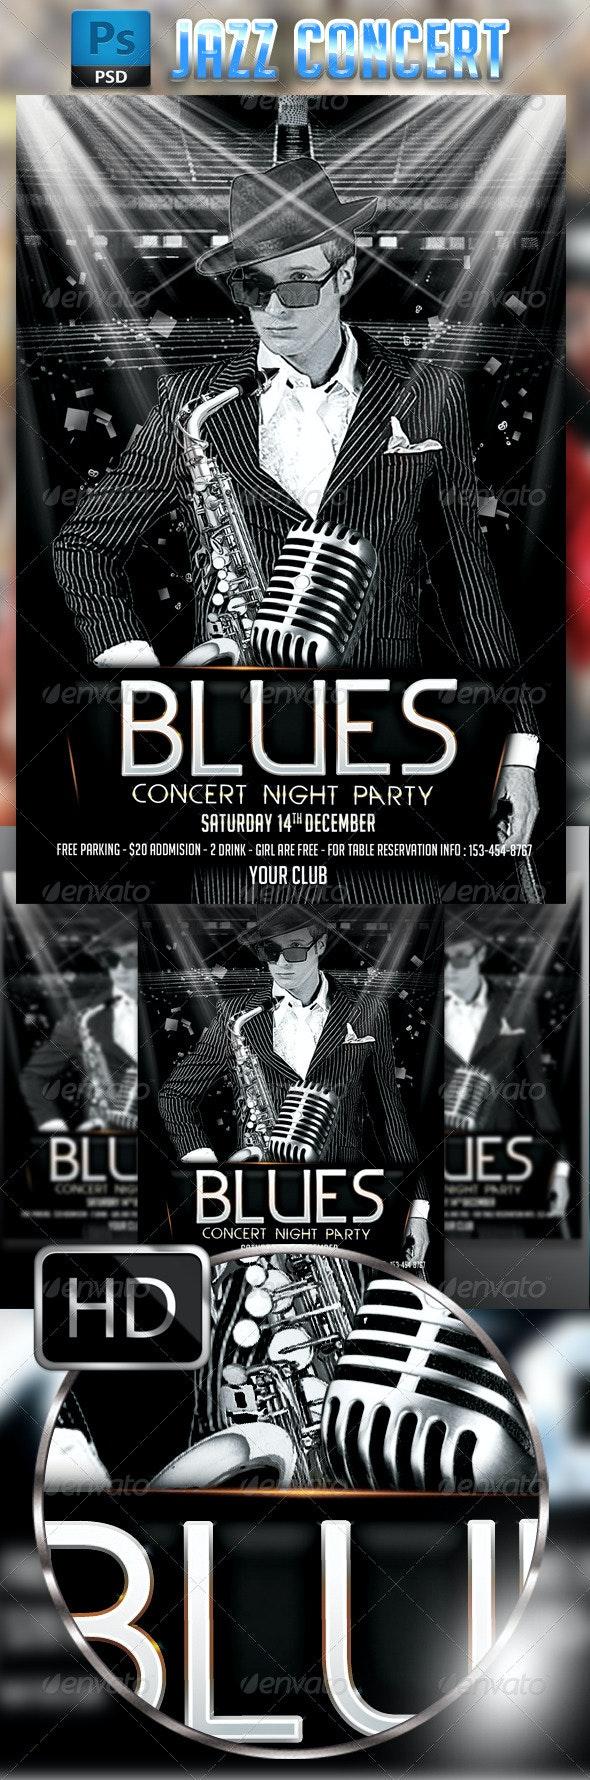 Jazz / Blues Concert Flyer - Concerts Events